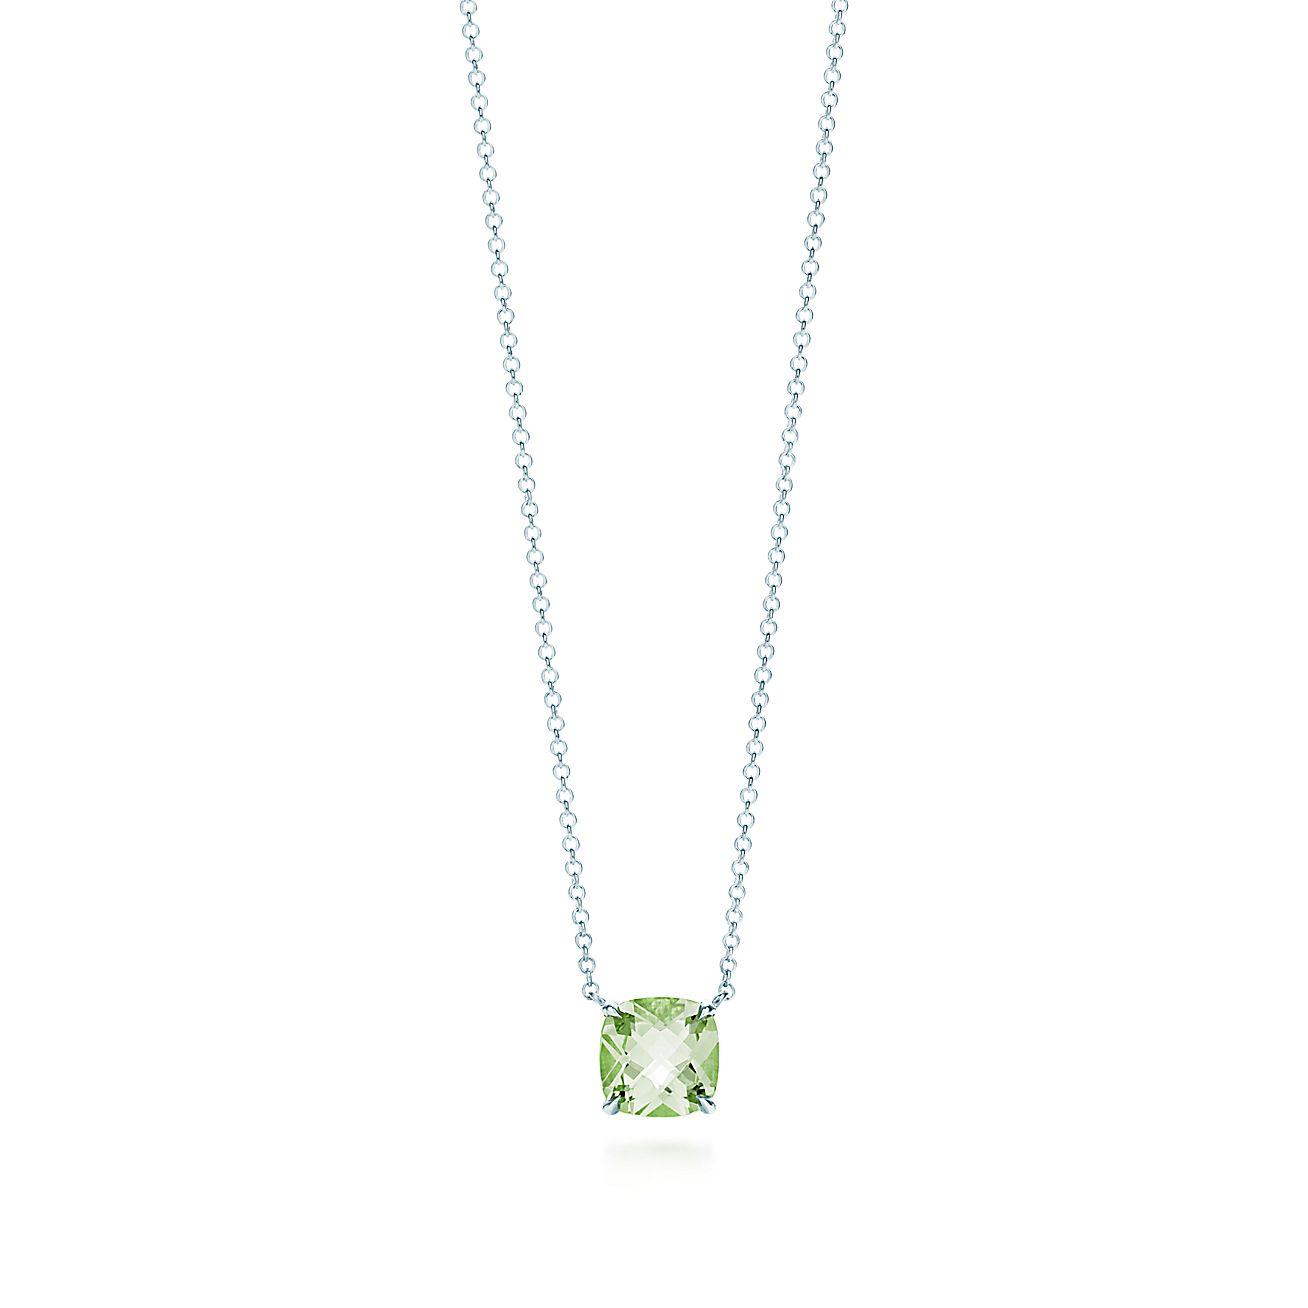 Tiffany Sparklers<br> Green Quartz pendant